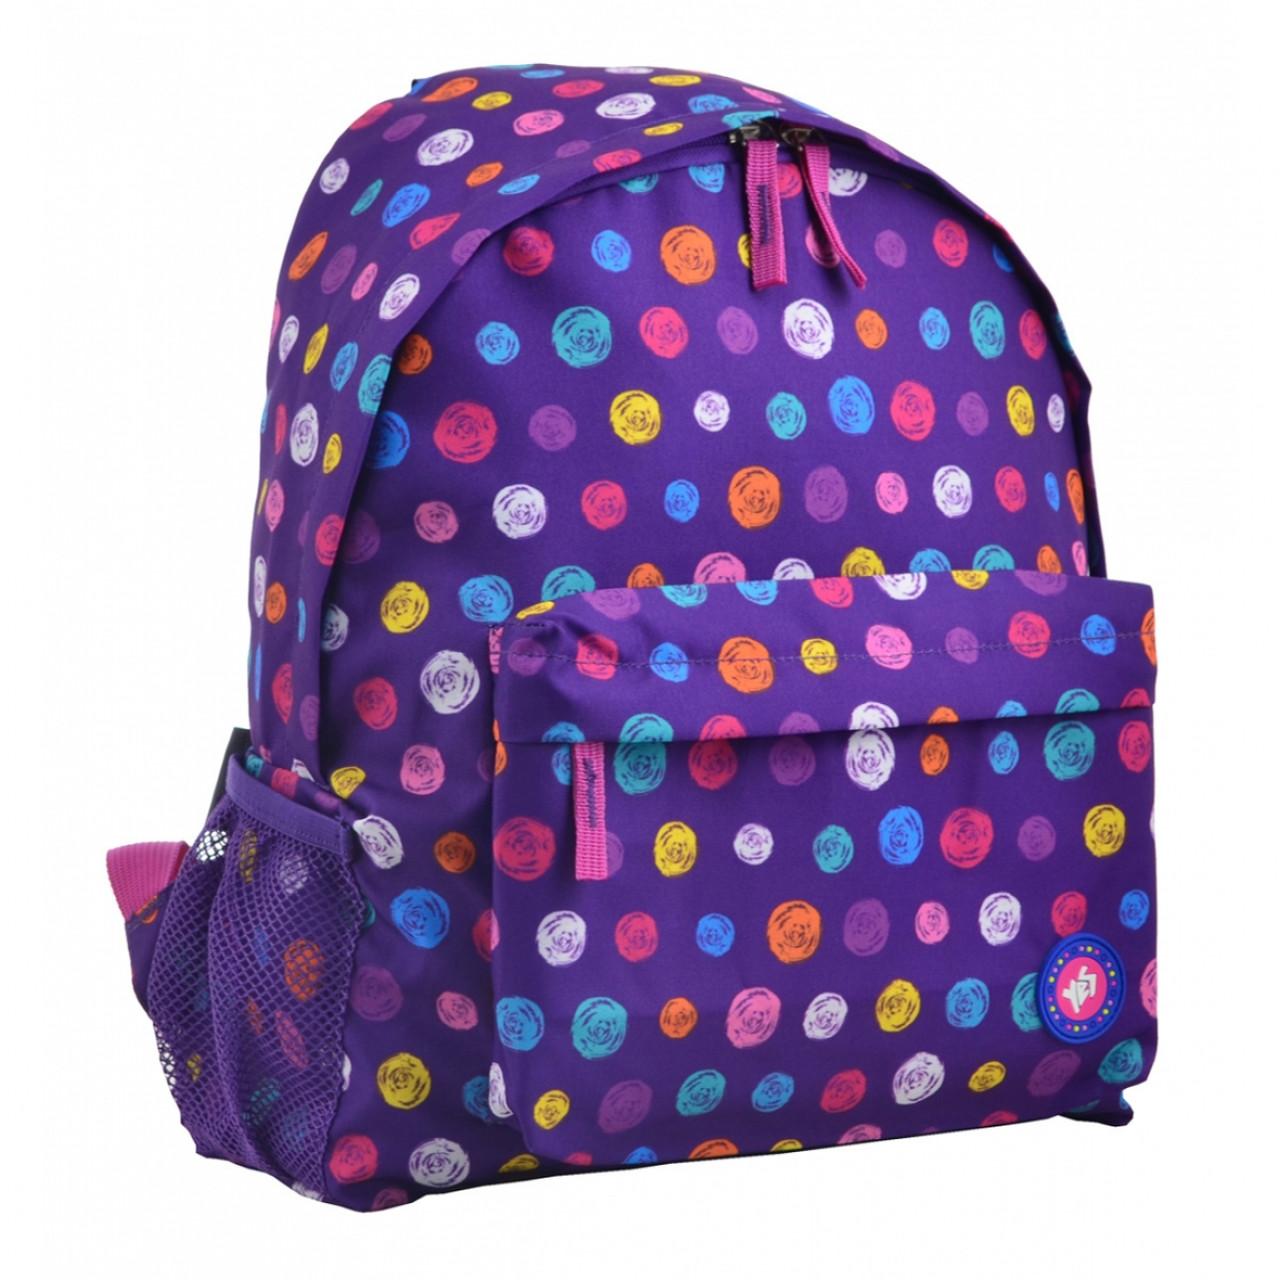 Рюкзак молодежный YES  ST-33 Pumpy, 35*29*12